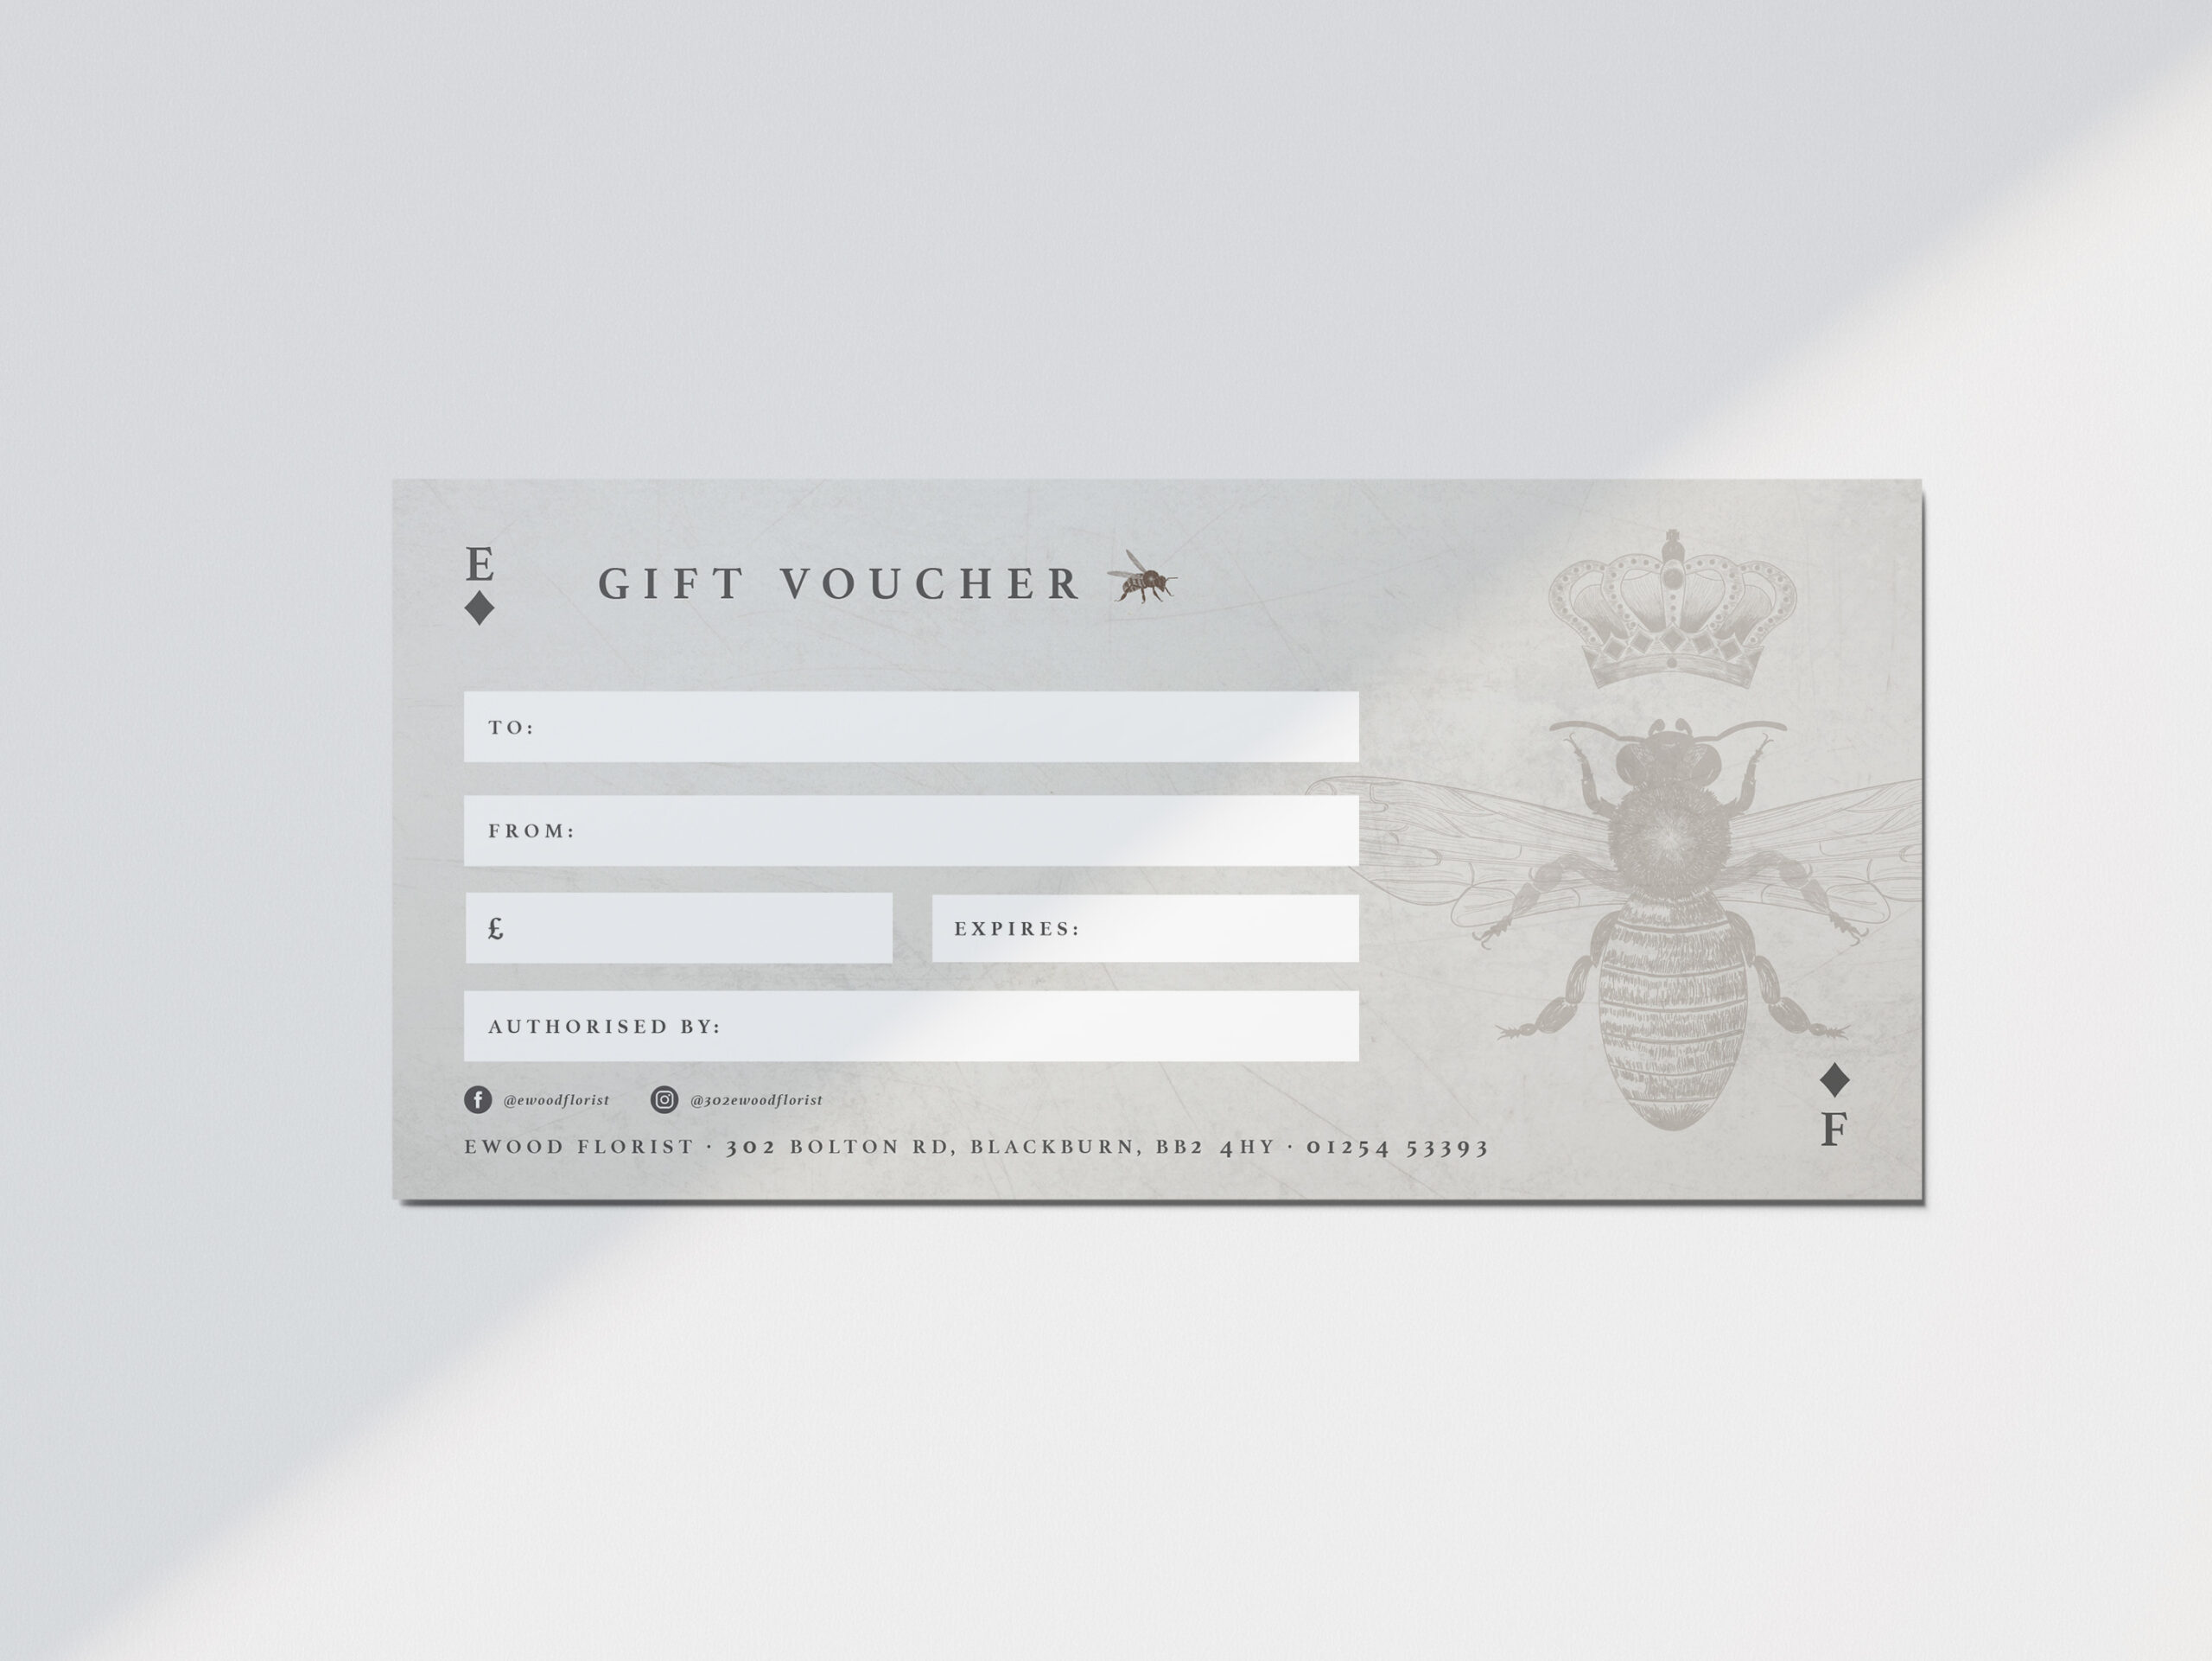 Ewood Florist Blackburn, Gift Voucher design by Very Vivid, Graphic Designer Blackburn